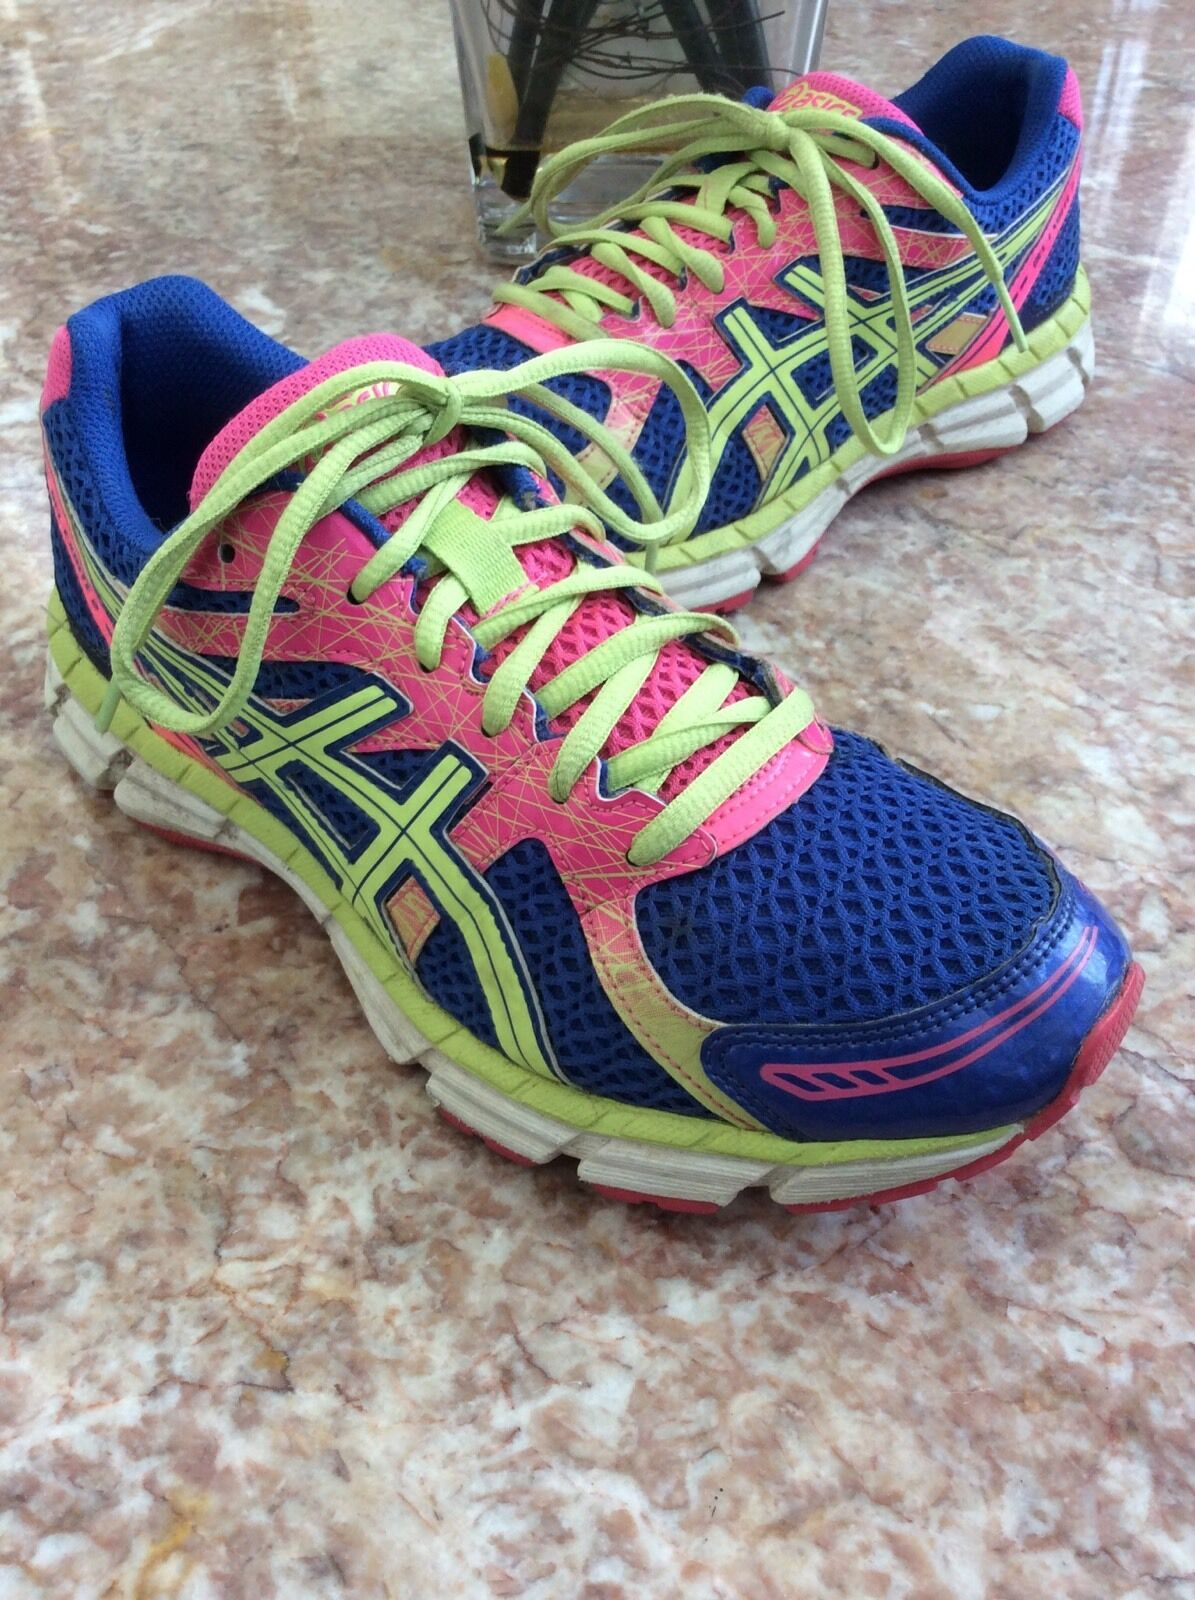 Asics Gel-Excite 2 Women's bluee Pink Light-Green Running shoes Size 8, T483N EUC